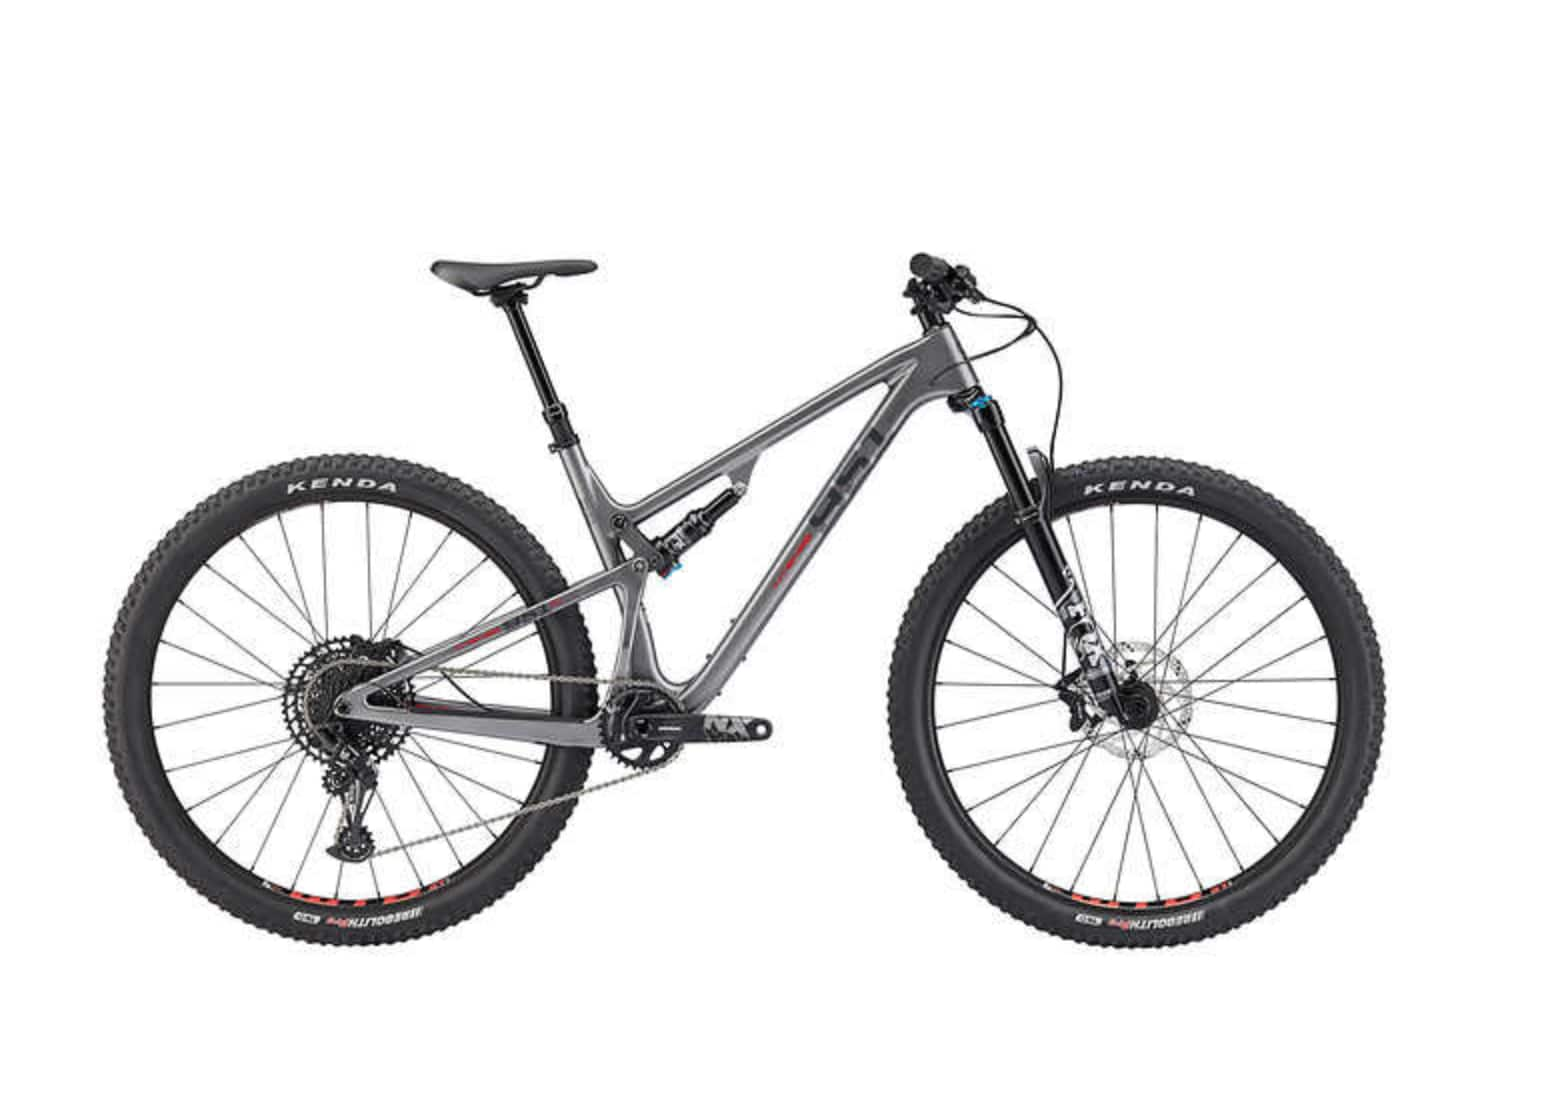 INTENSE 951 XC Bike @ Costco.com $3249.99